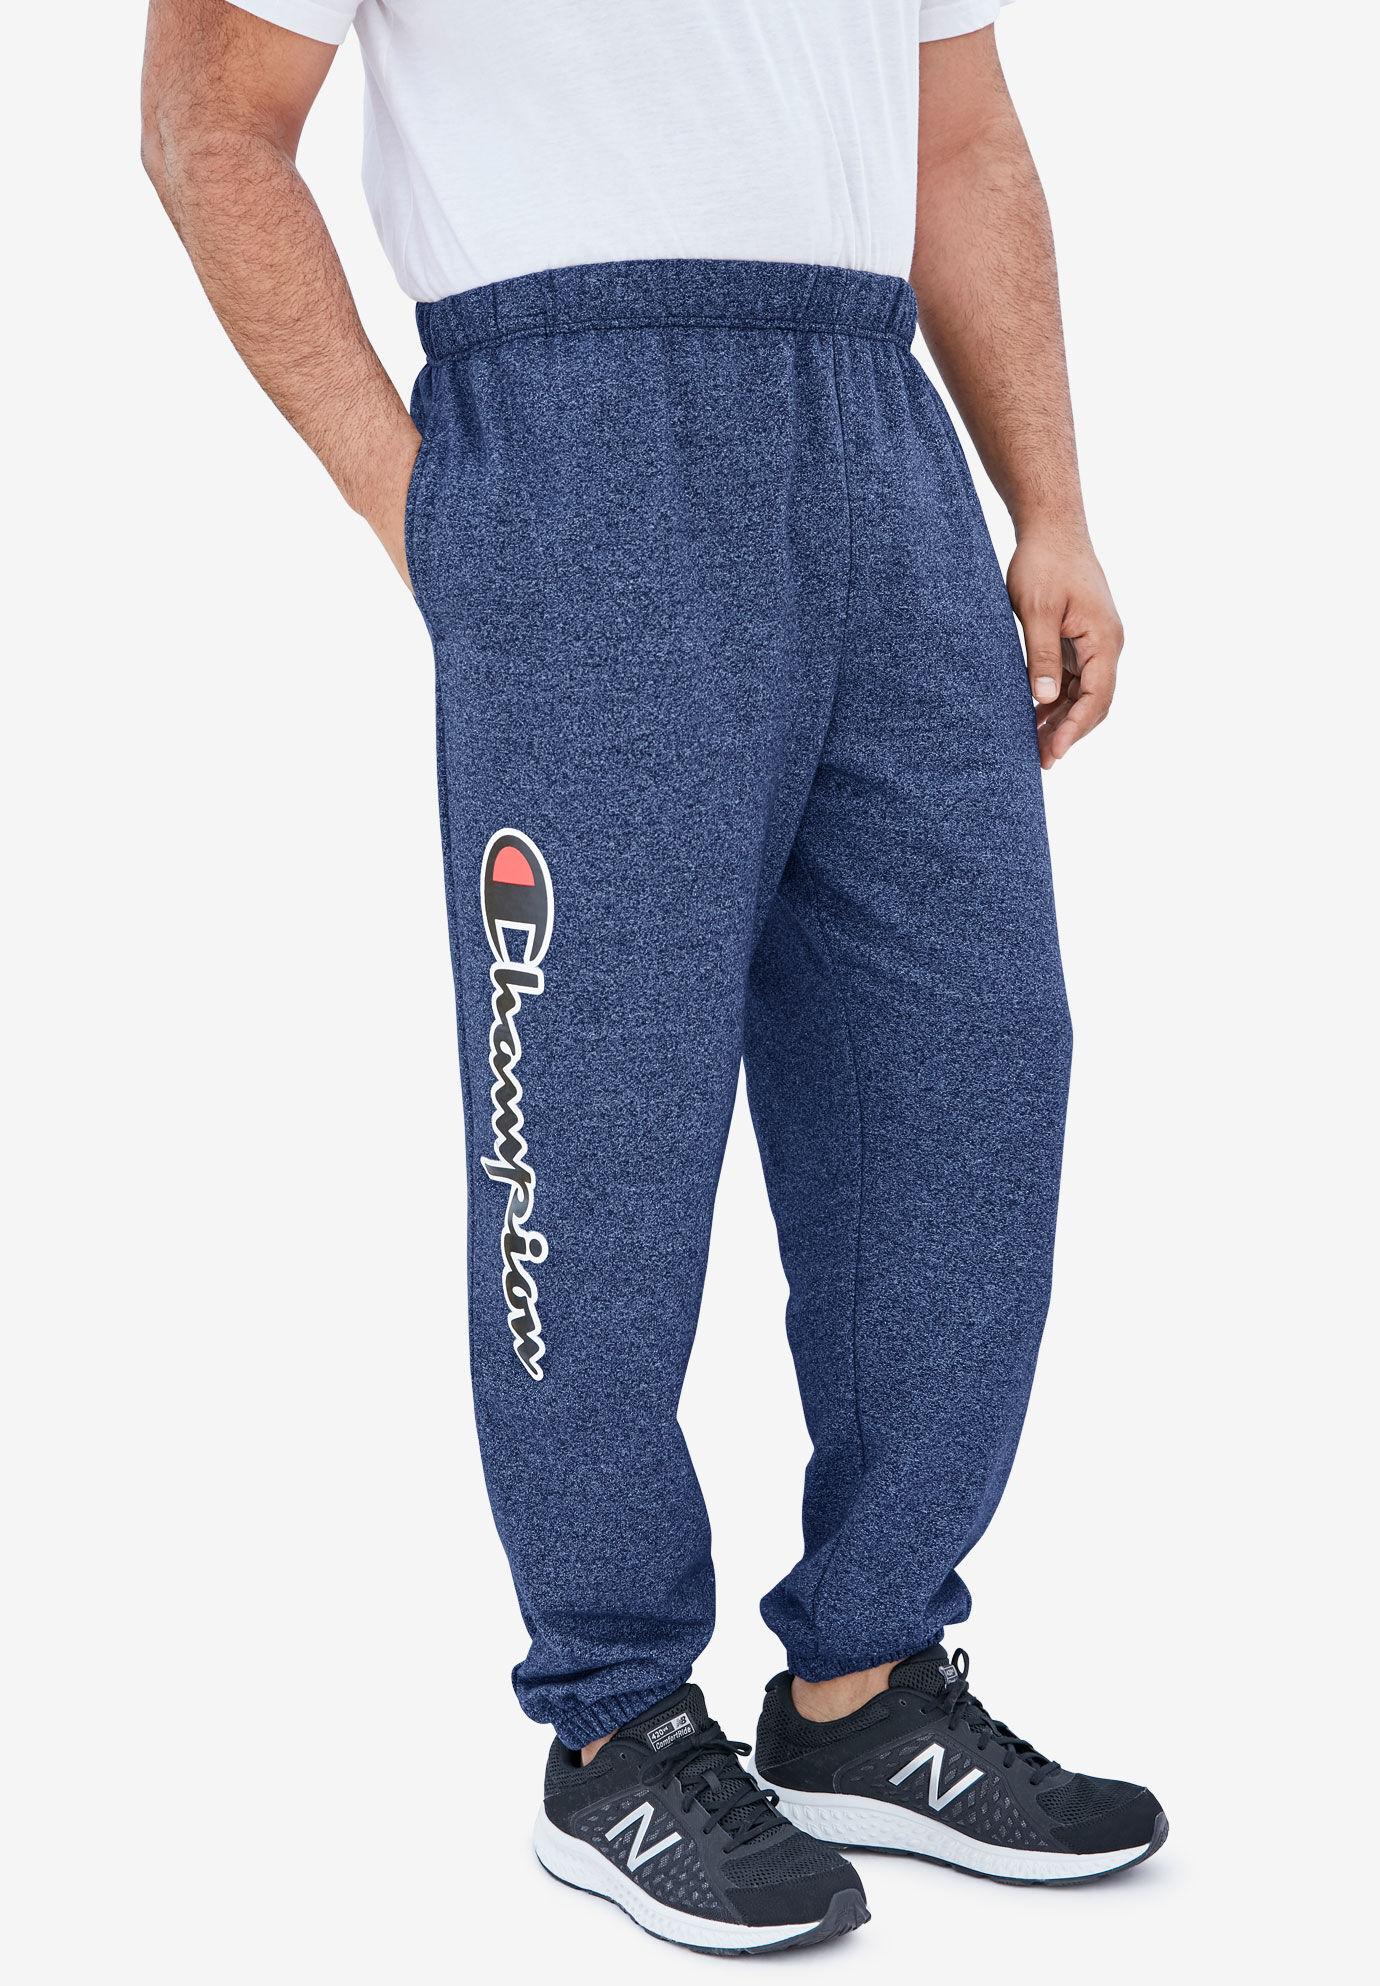 Champion Big /& Tall Dark Grey Sweatpants  $40 Brand New With Tags